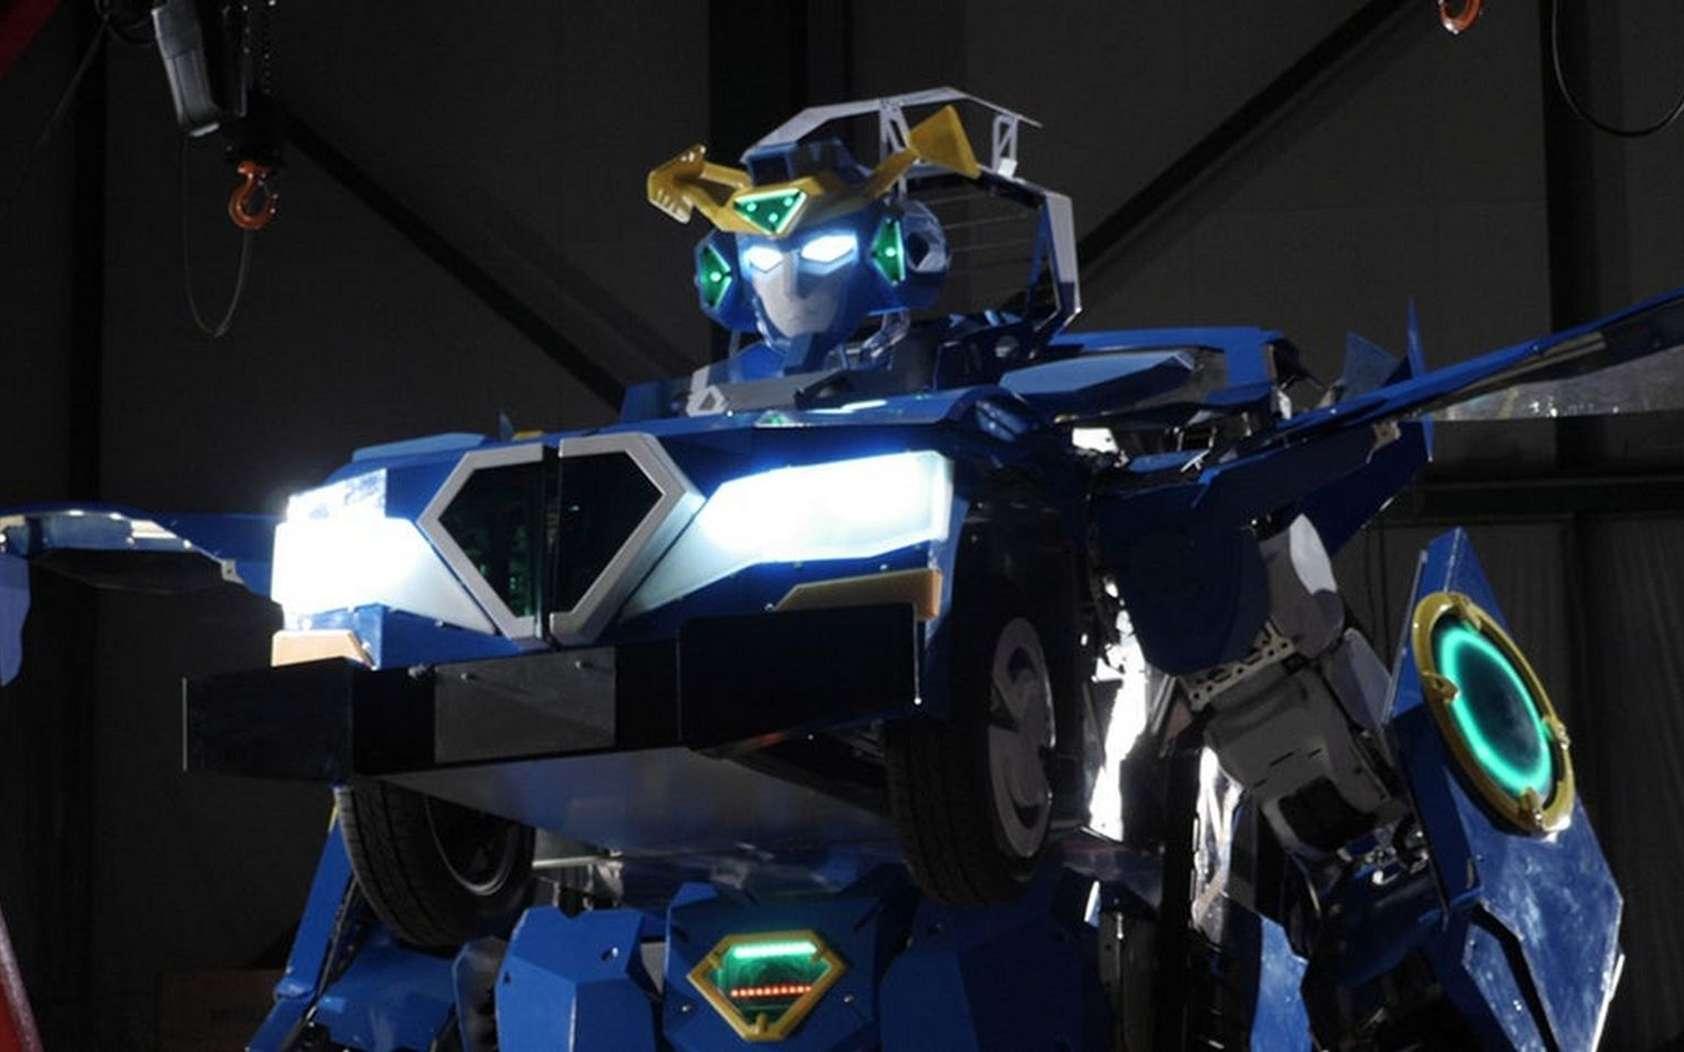 La voiture Transformer J-deite RIDE de Brave Robotics. © Brave Robotics